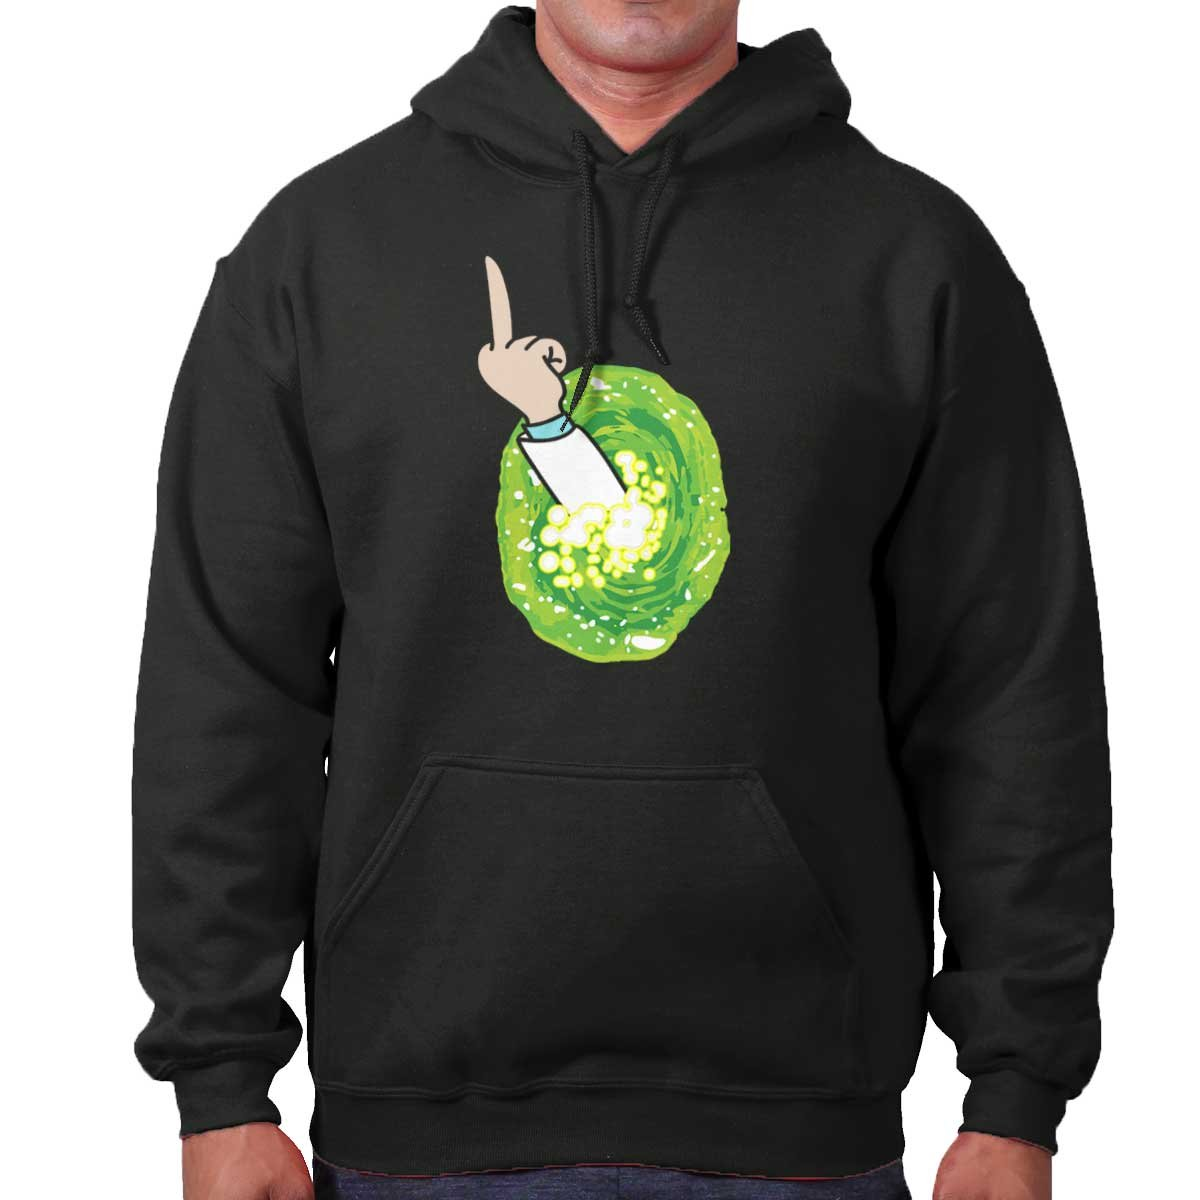 Brisco Brands Portal Rick Sanchez Schwifty Cool Funny Morty GLIP Glop Edgy Hoodie Sweatshirt